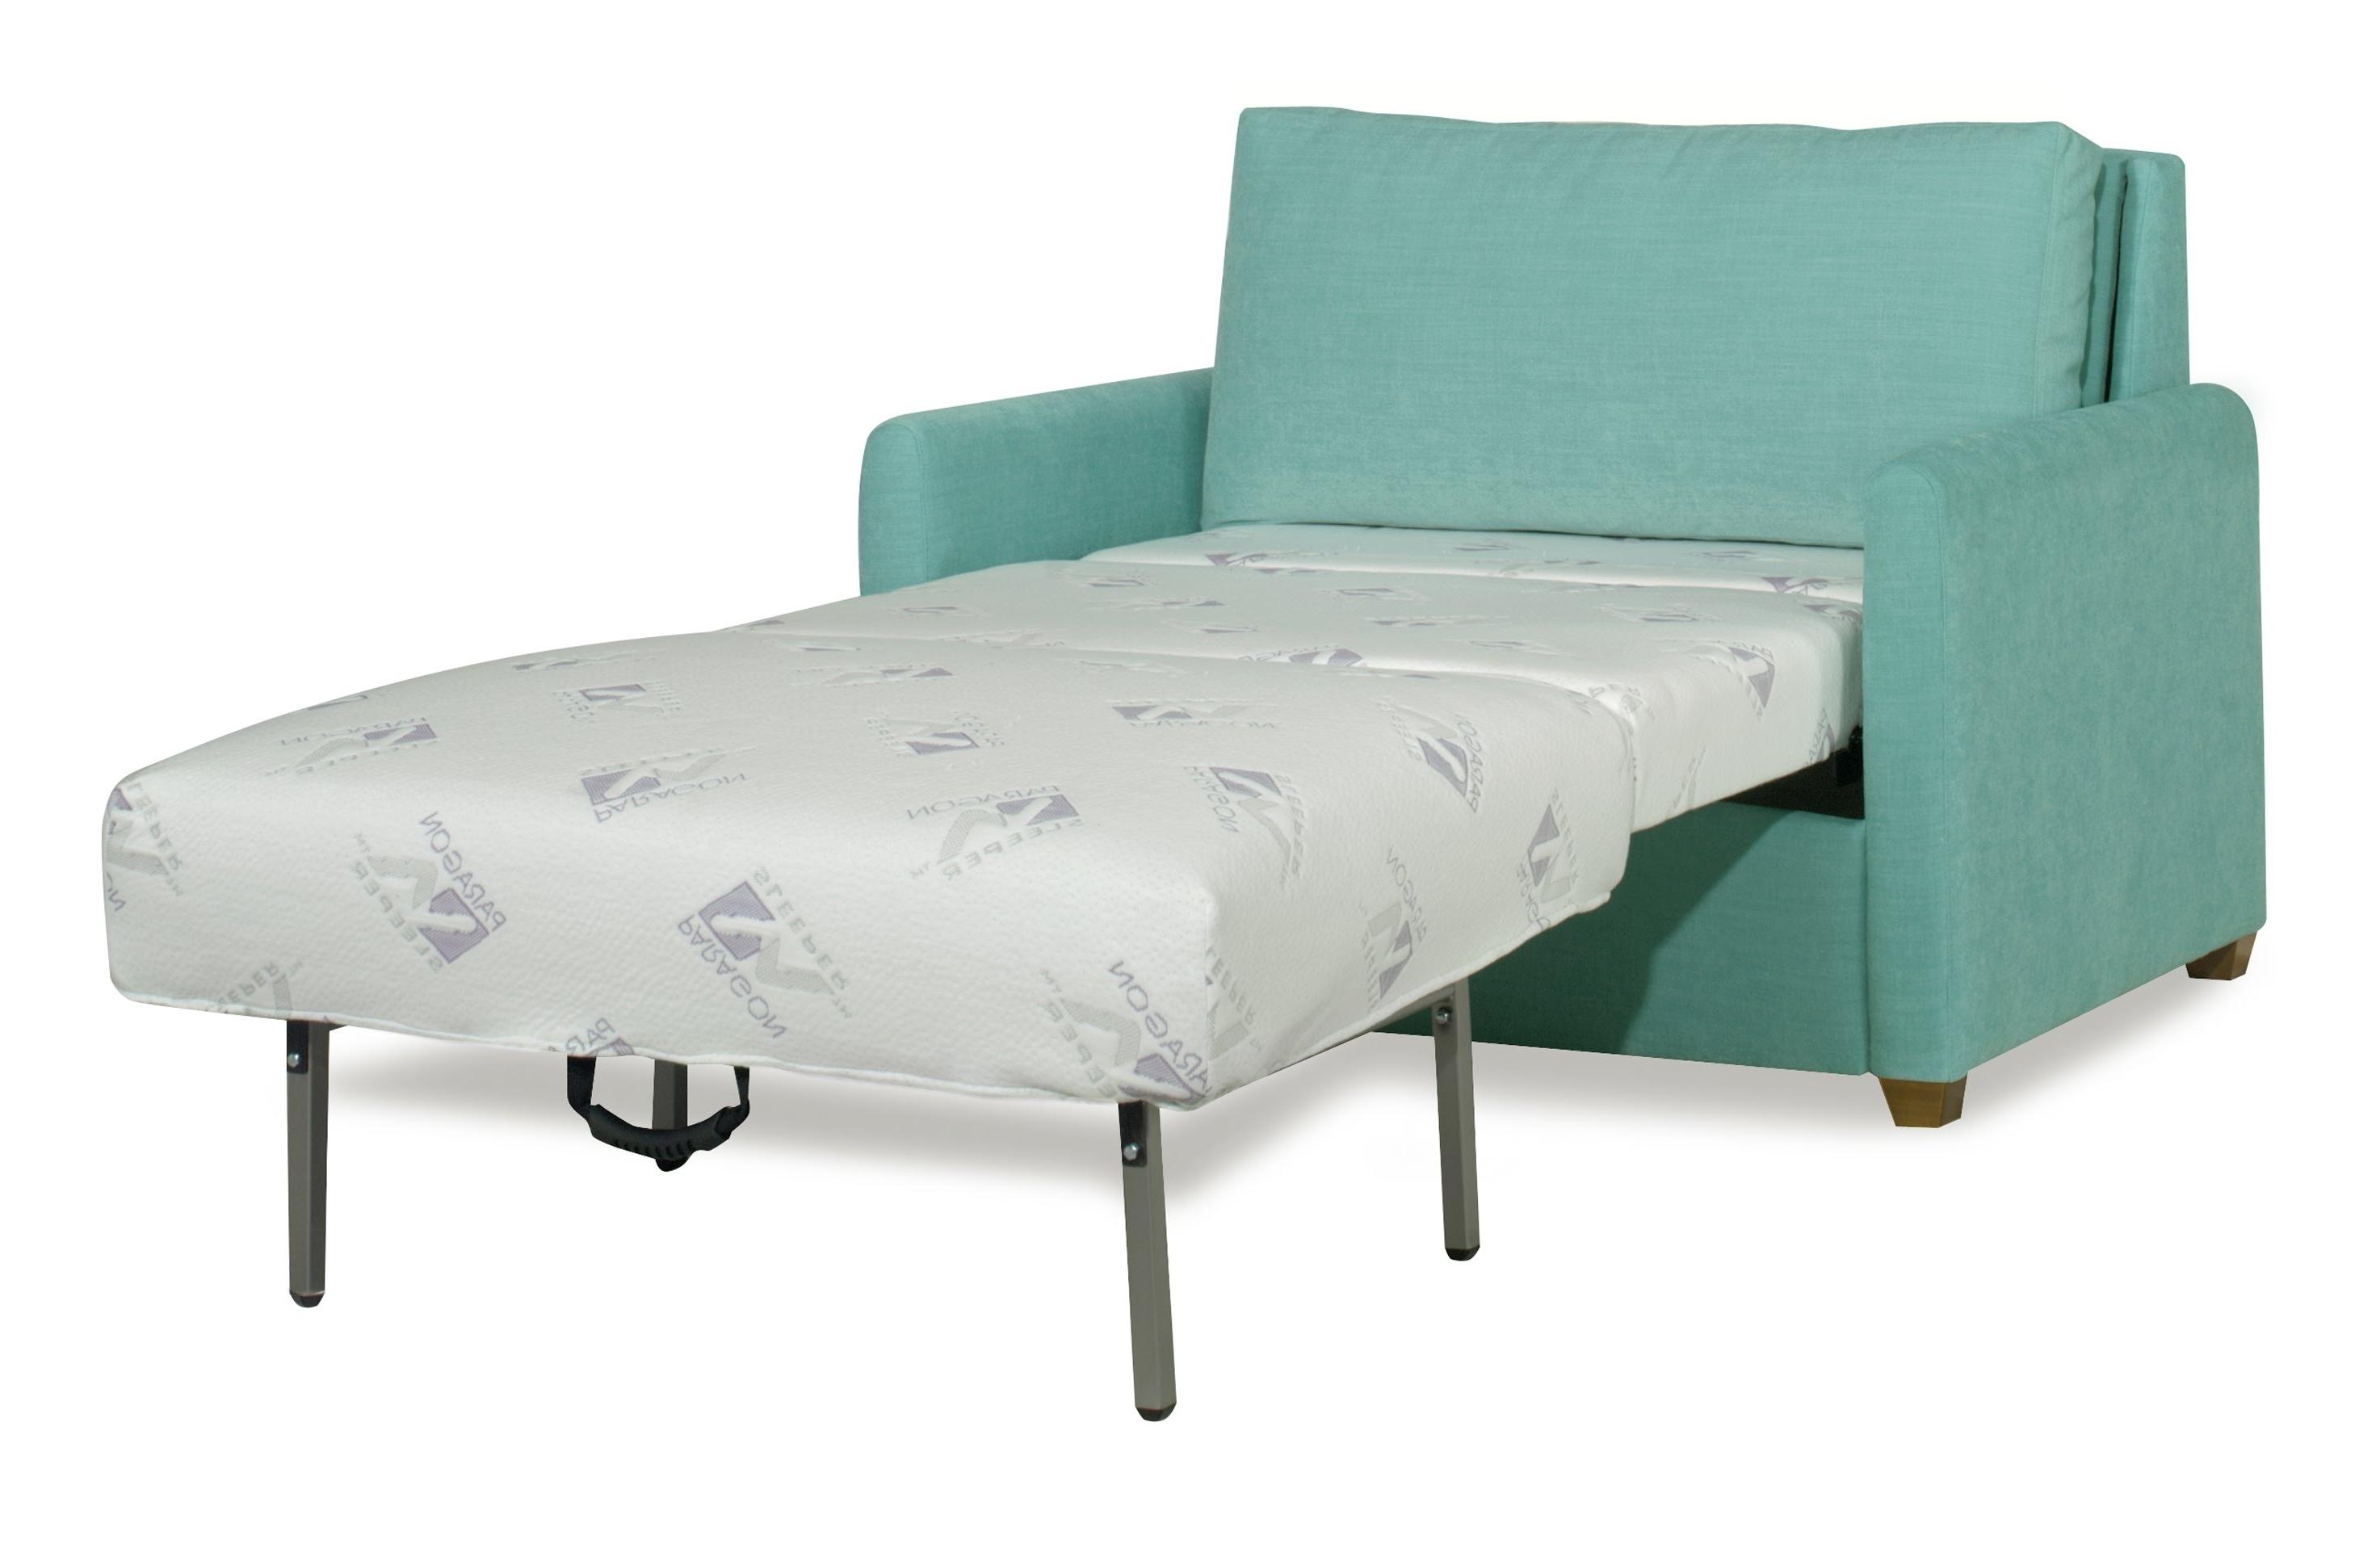 561Restaurant Inside Ikea Loveseat Sleeper Sofas (View 2 of 20)